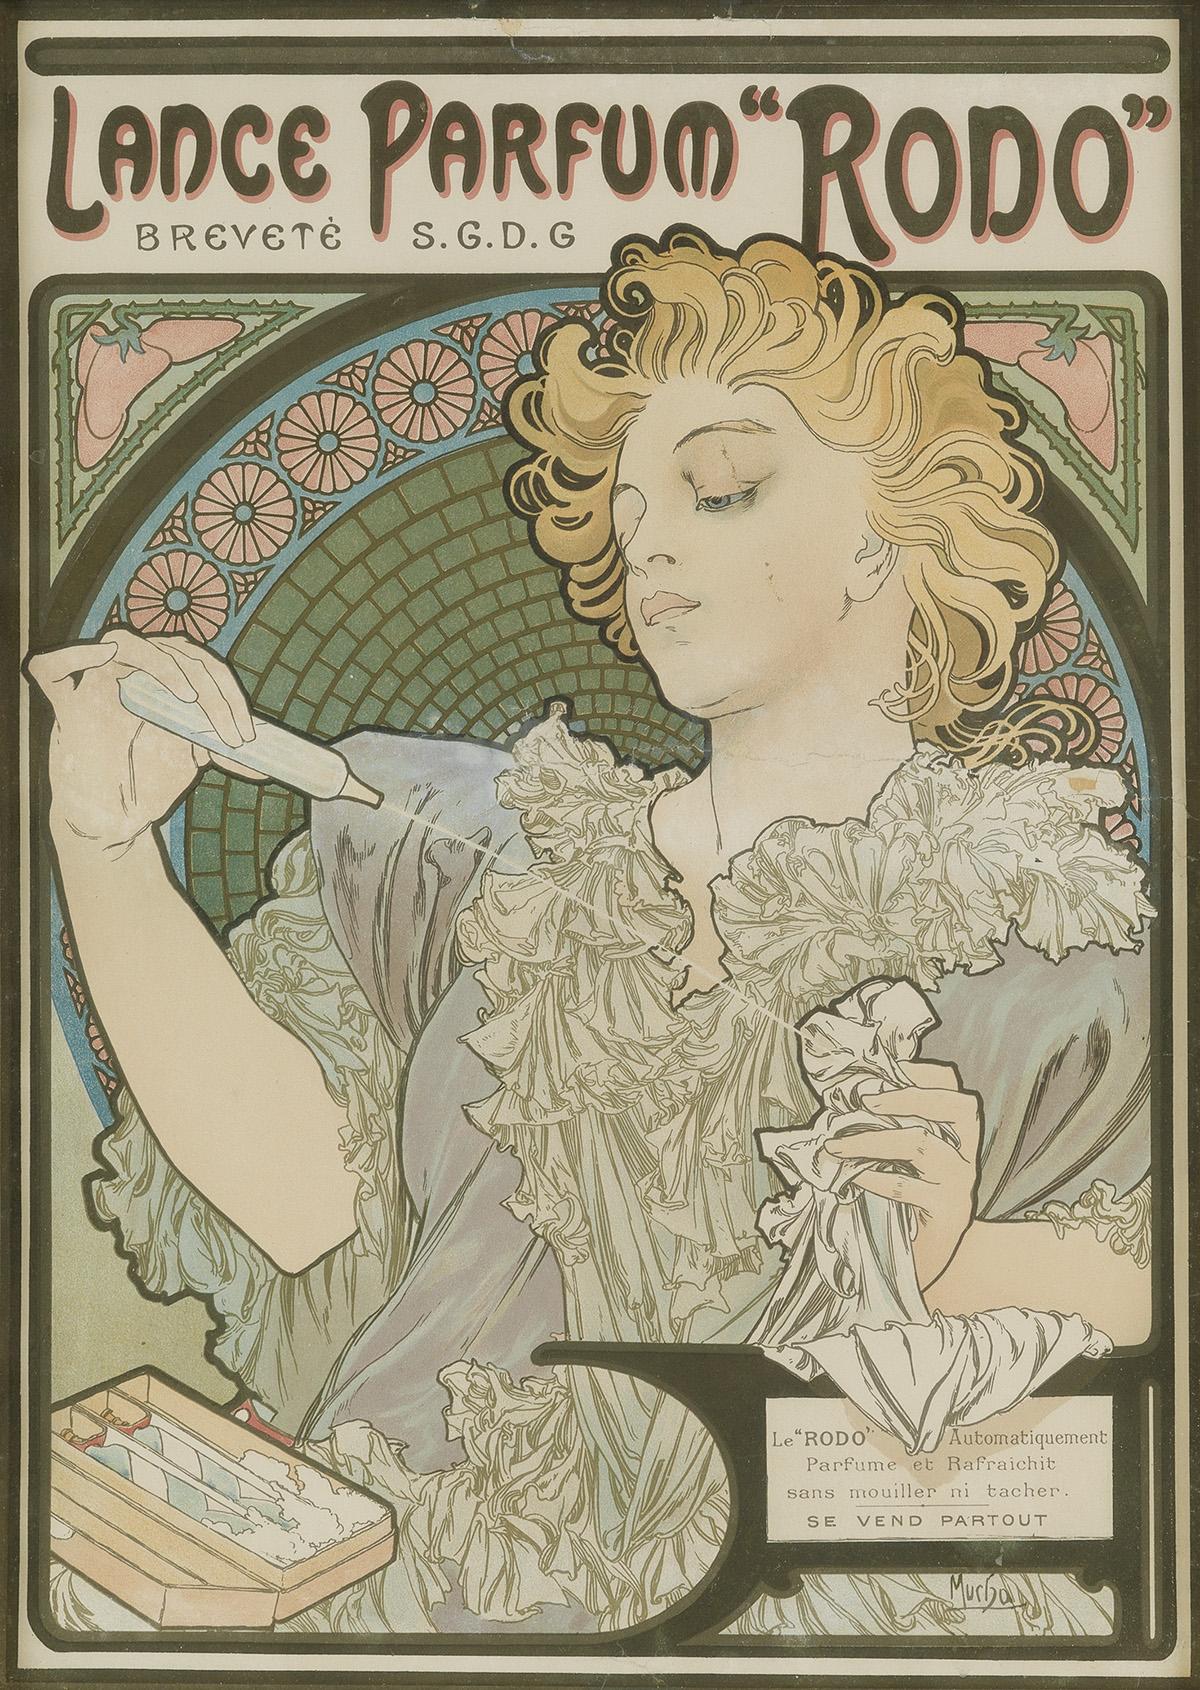 ALPHONSE-MUCHA-(1860-1939)-LANCE-PARFUM-RODO-1896-16x12-inch